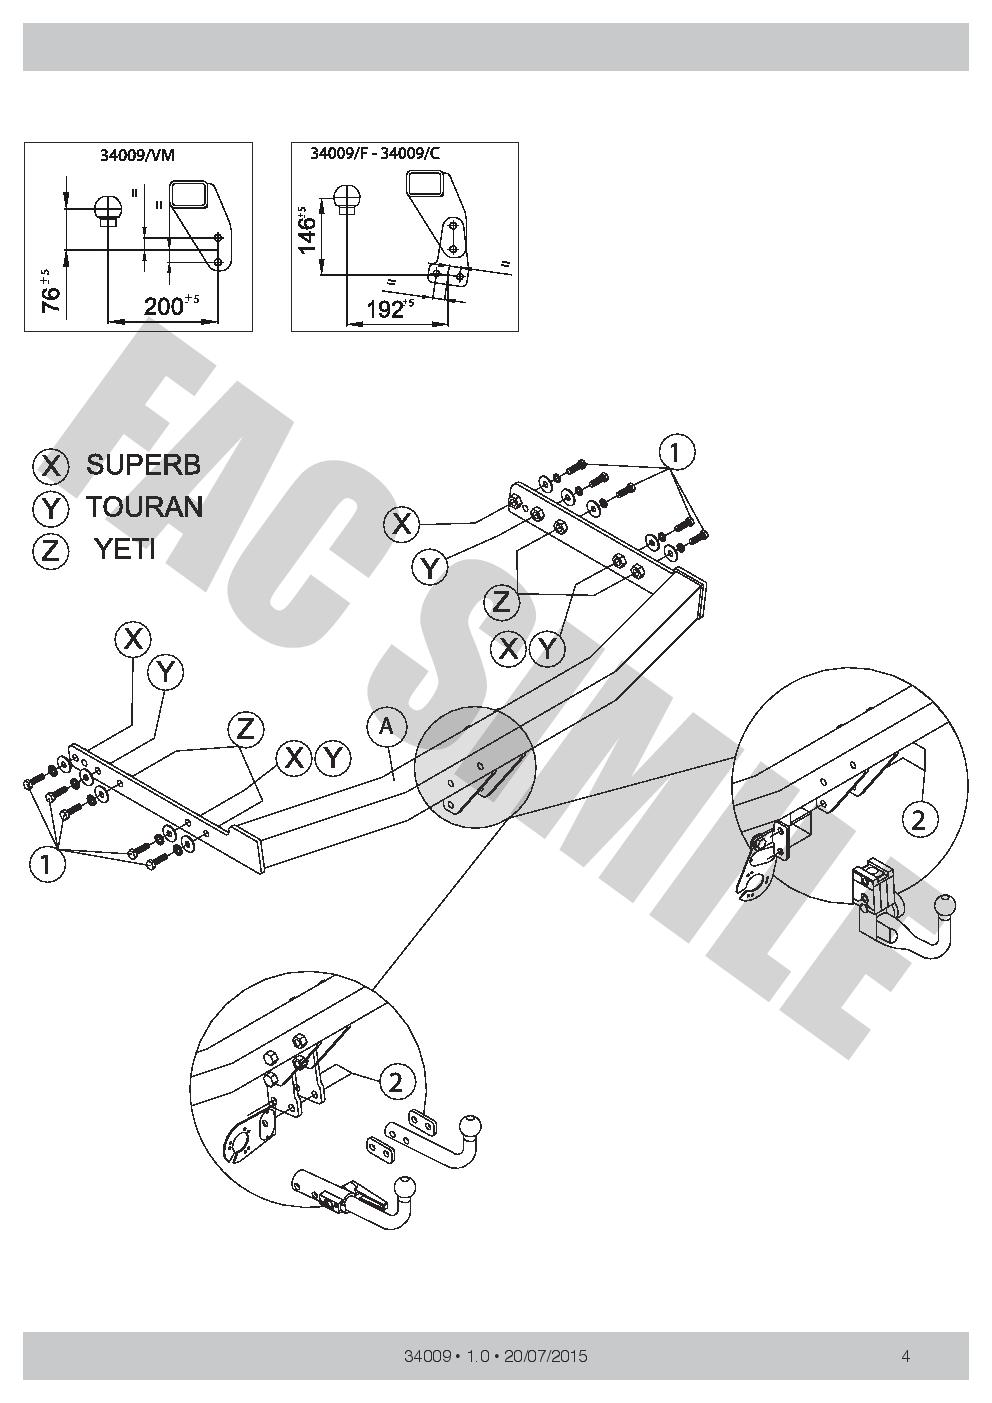 311d skoda superb towbar wiring diagram | wiring library  wiring library